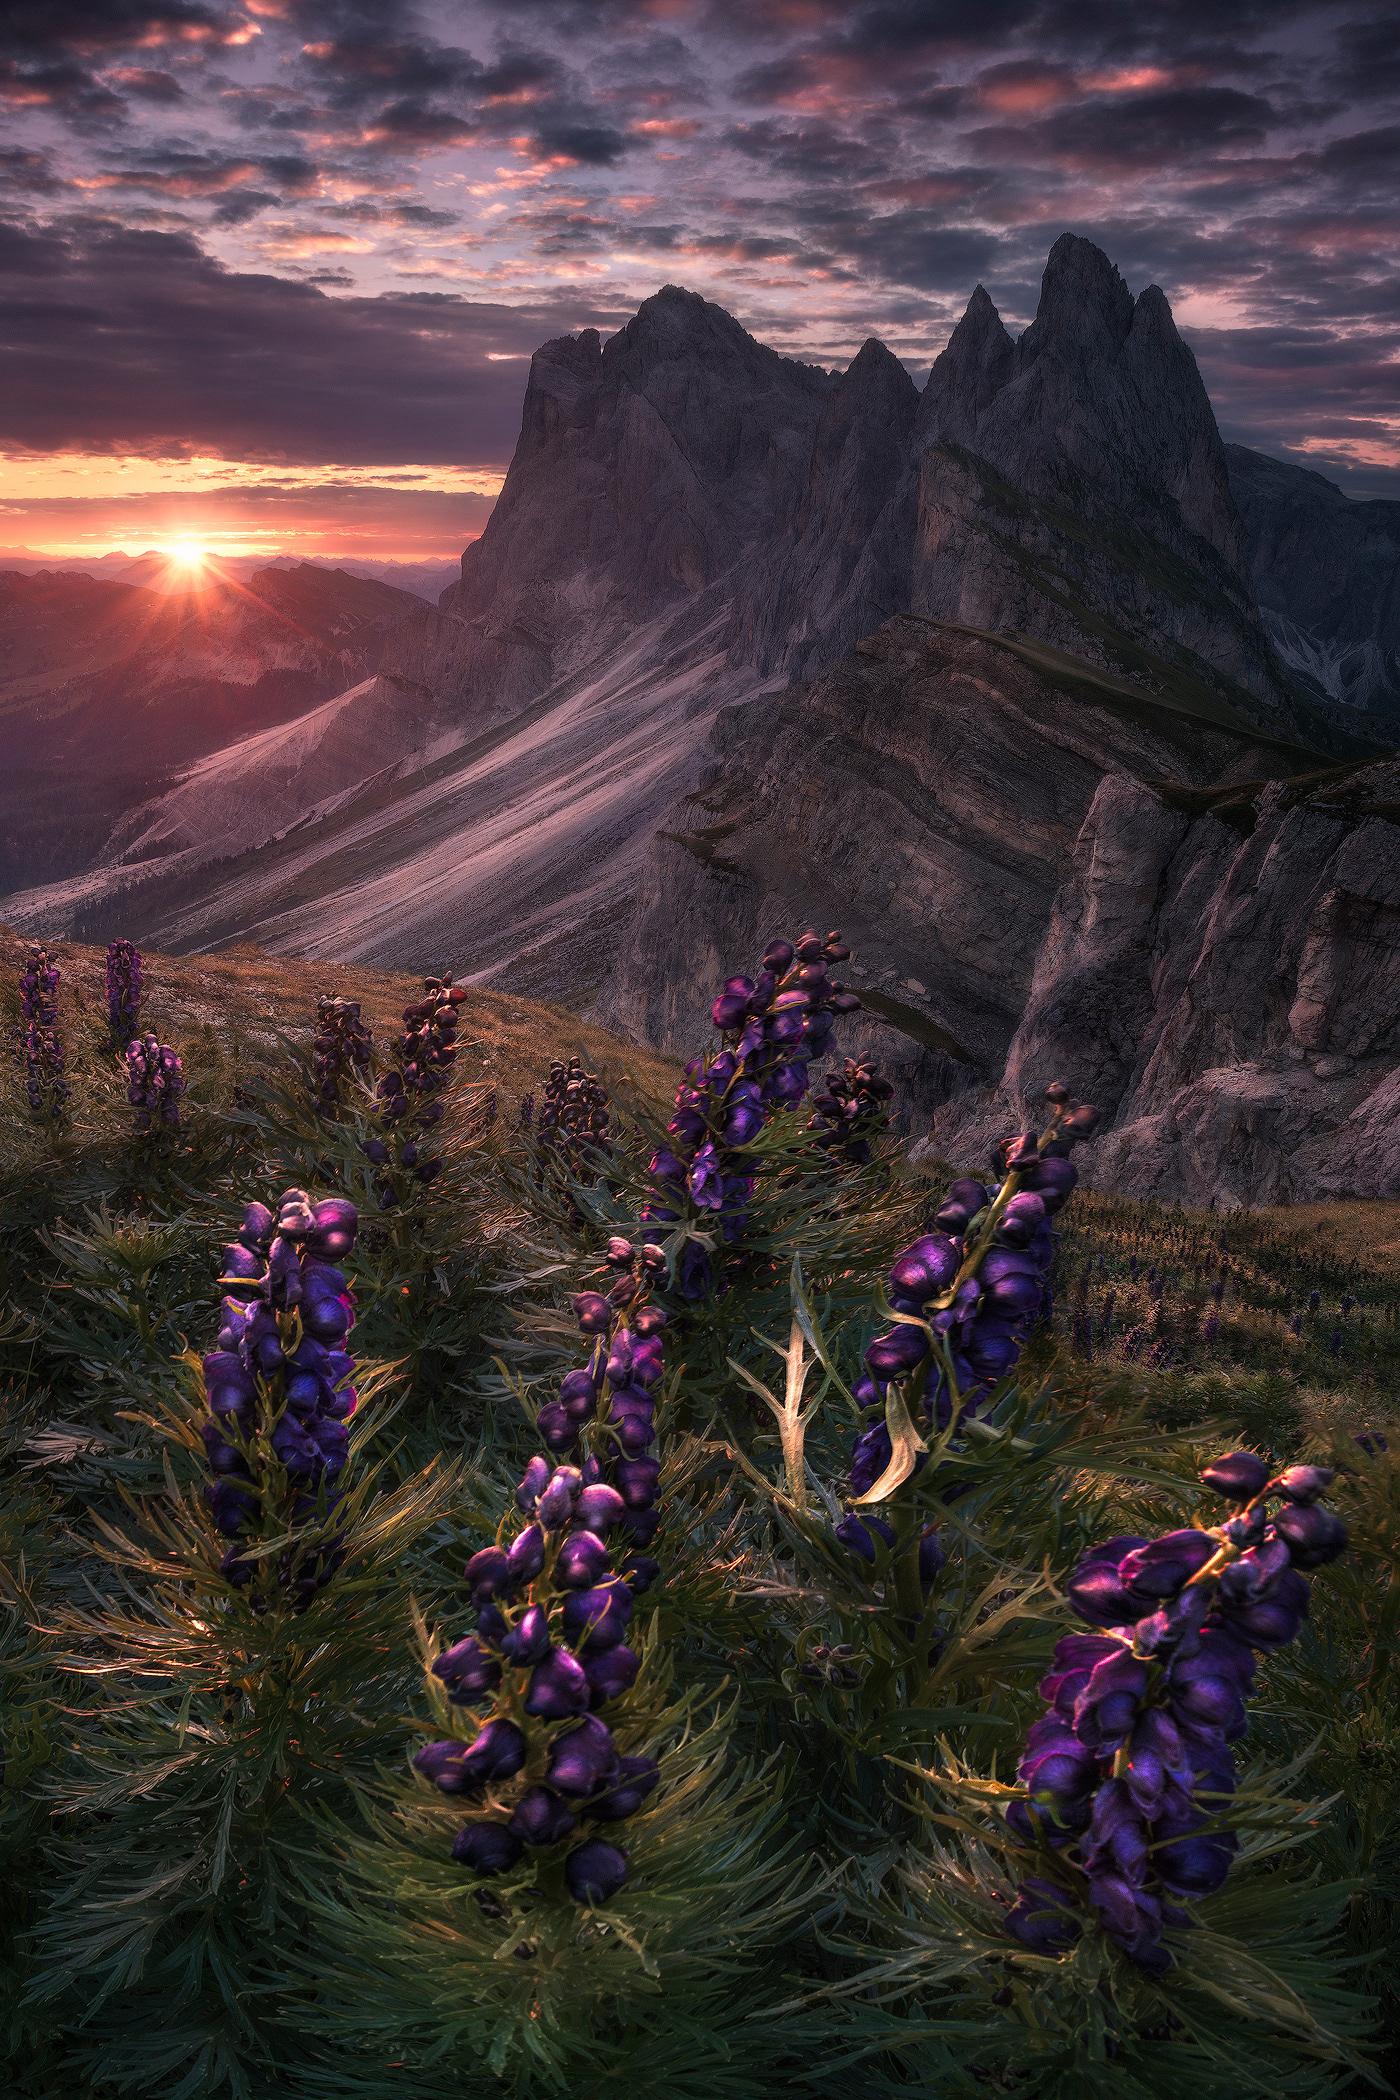 alps,dolomites,Flowers,Landscape,landscape photography,Nature,nature photography,Switzerland